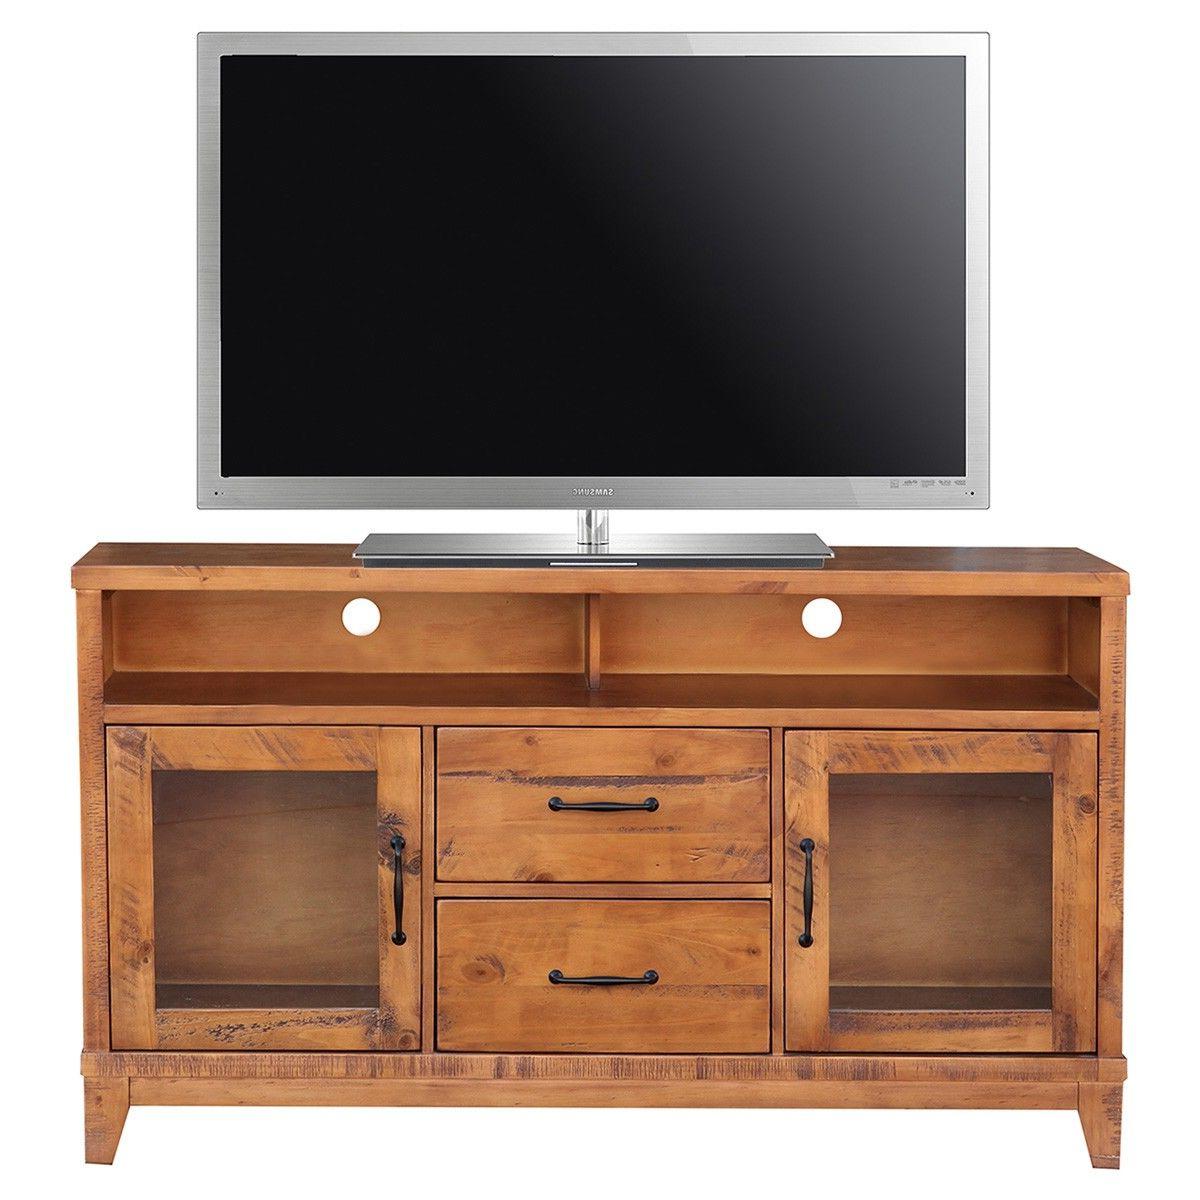 Belfort Pine Timber 2 Door 2 Drawer High Tv Stand, 140cm In Manhattan 2 Drawer Media Tv Stands (View 7 of 20)